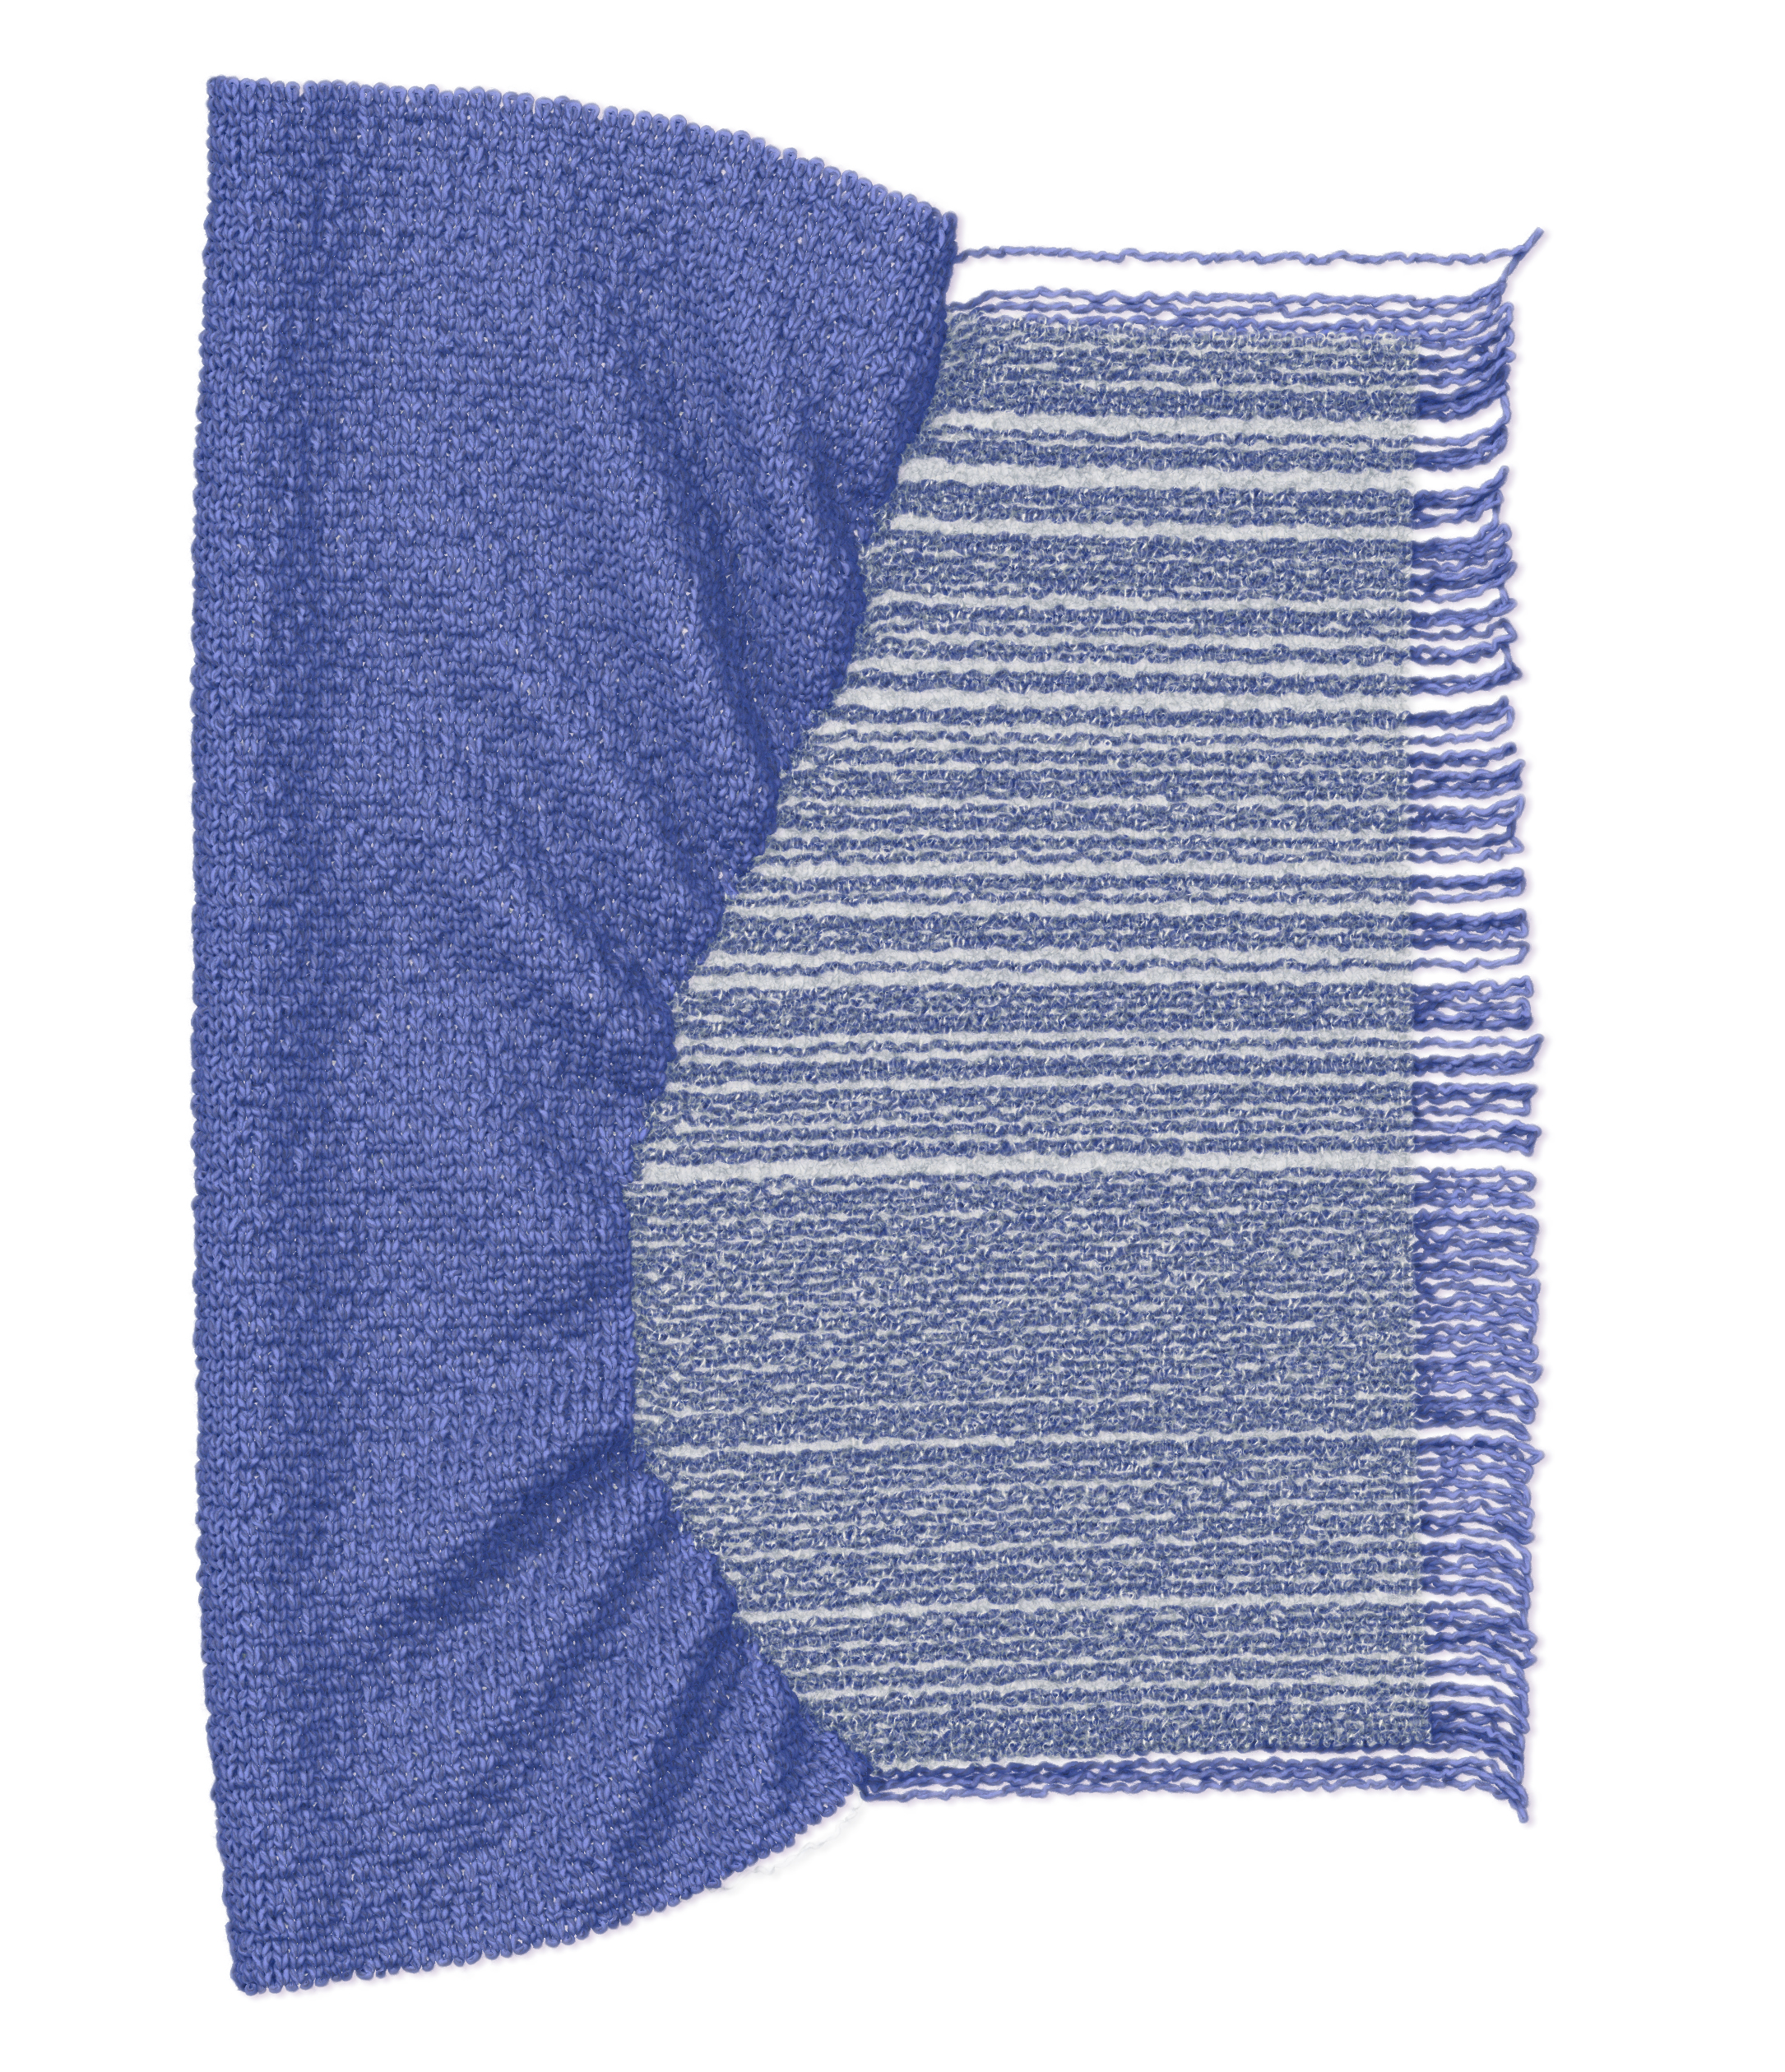 Virtual knitting rendering 4. © Linxi Zhu